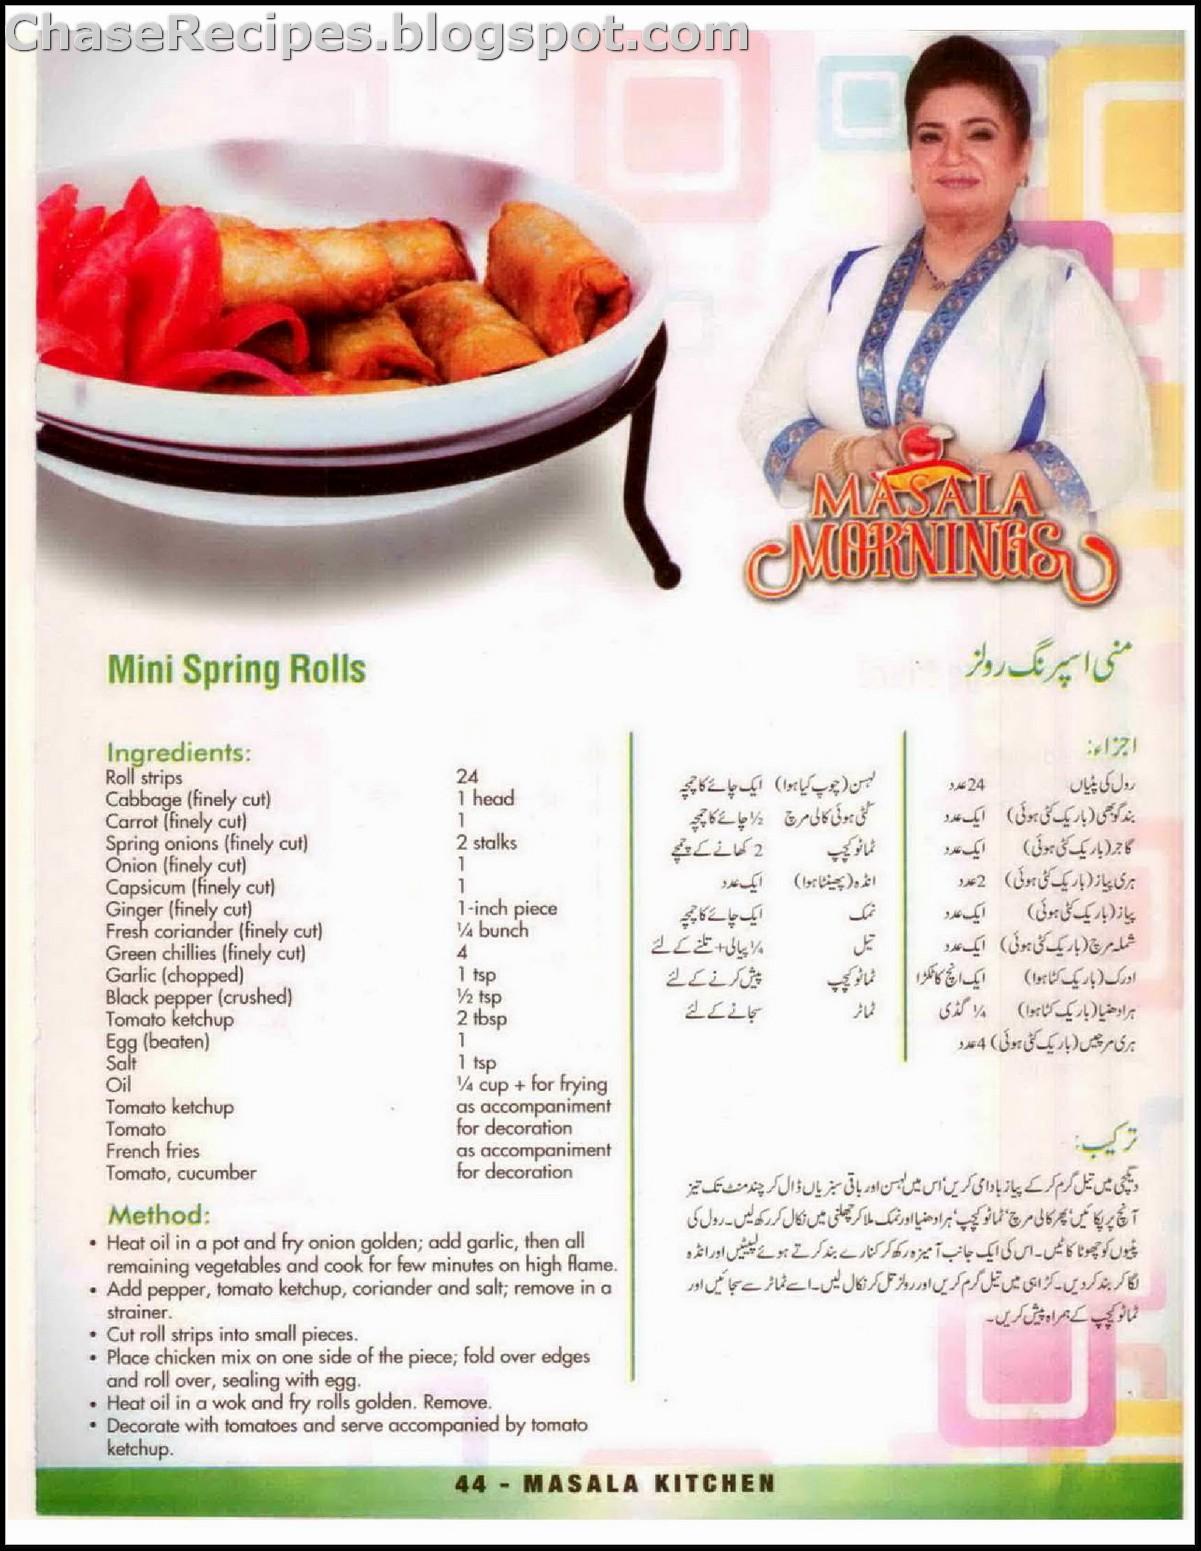 Mini Spring Rolls English/Urdu Recipe - Get Online - Chase Recipes